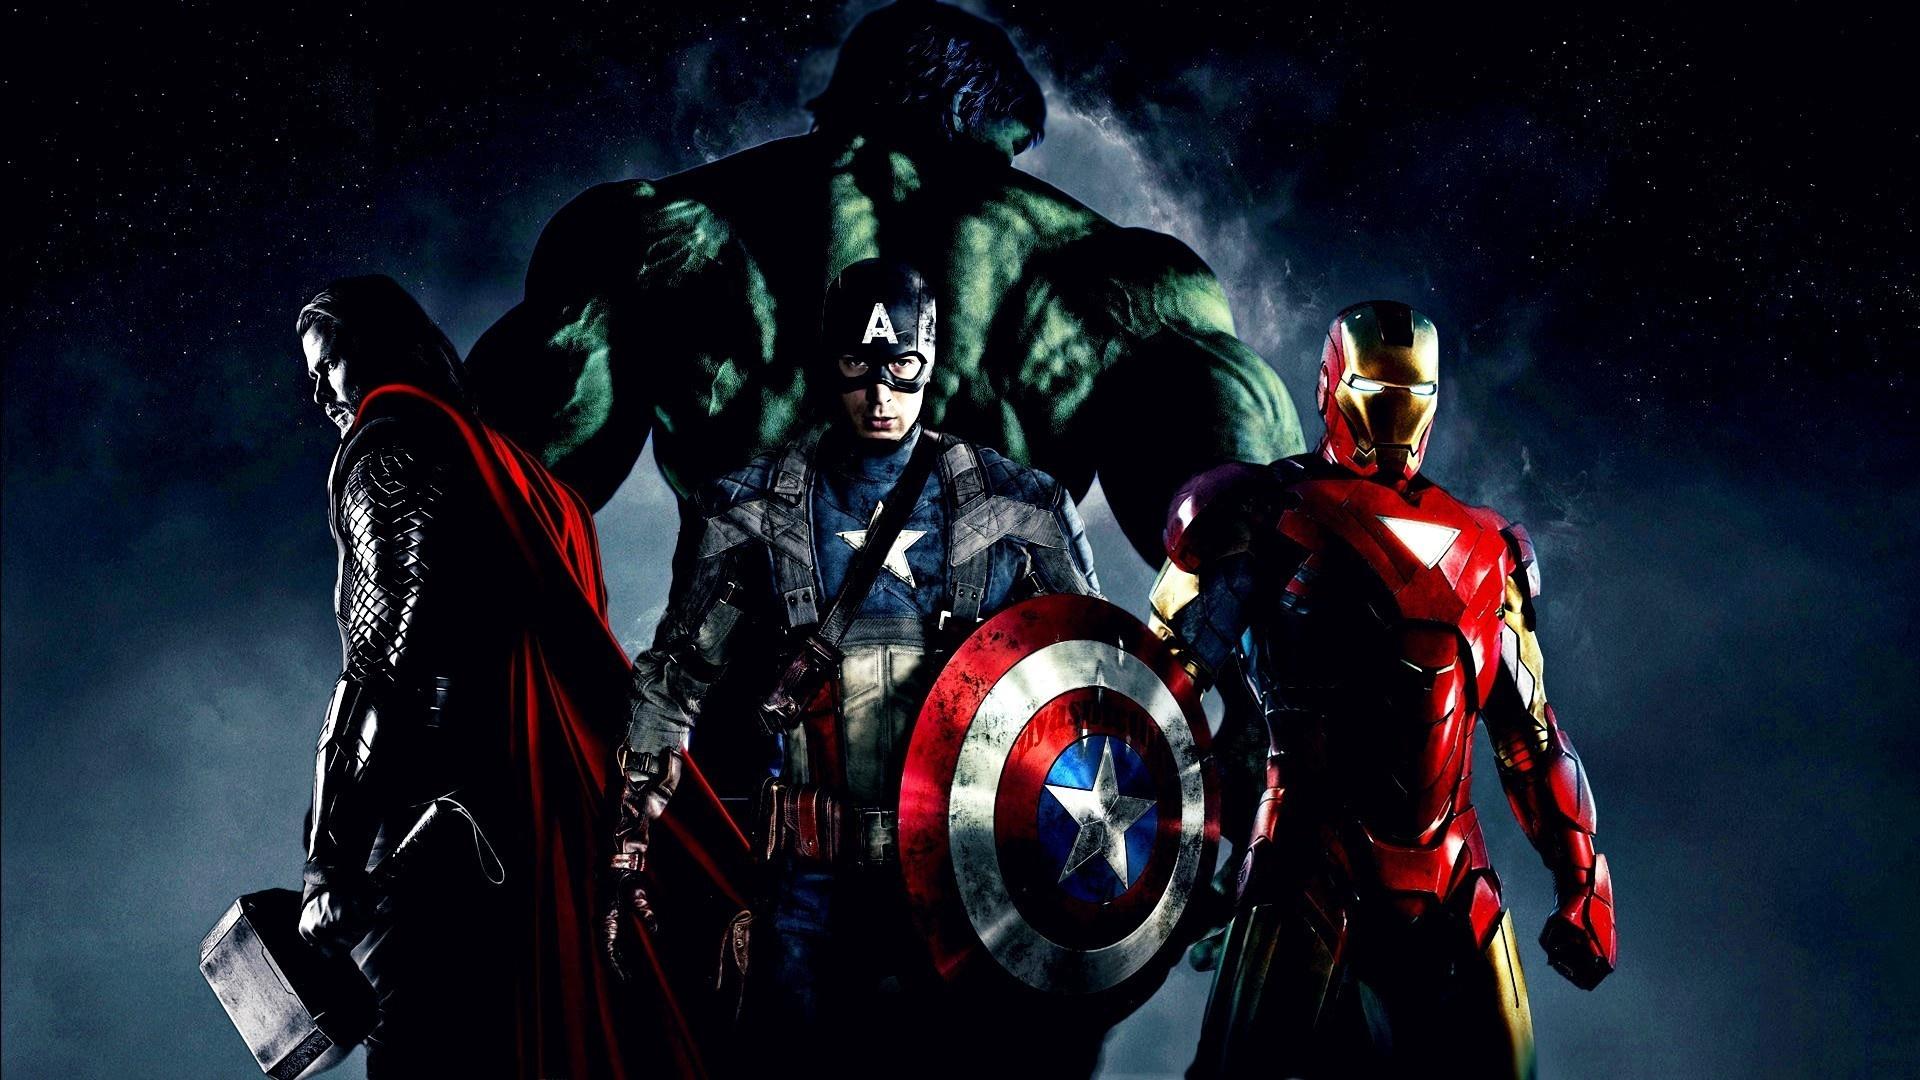 Iron Man 3 Hd Wallpaper 2880x1800 28466